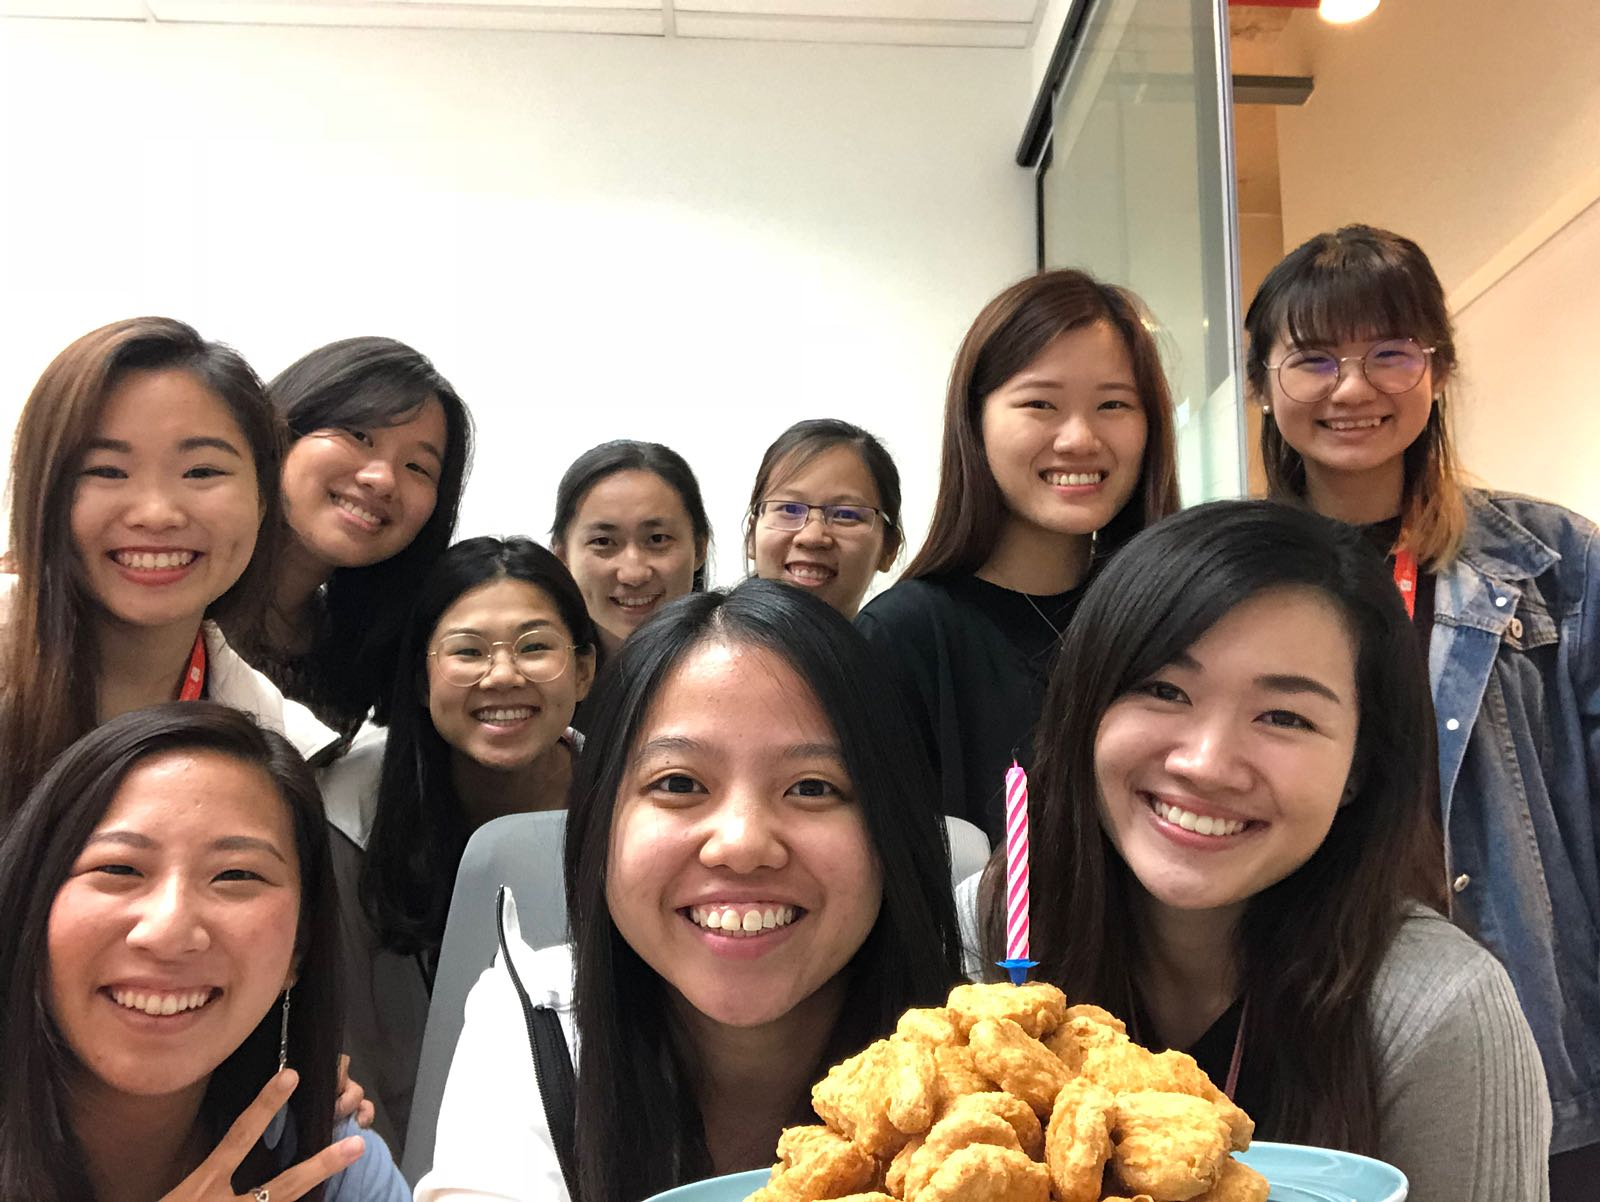 Shopee Career eCommerce Singapore Interview Lifeatshopee Auyong Yu Lin Enactus NTU Social Entrepreneurship Intute HR